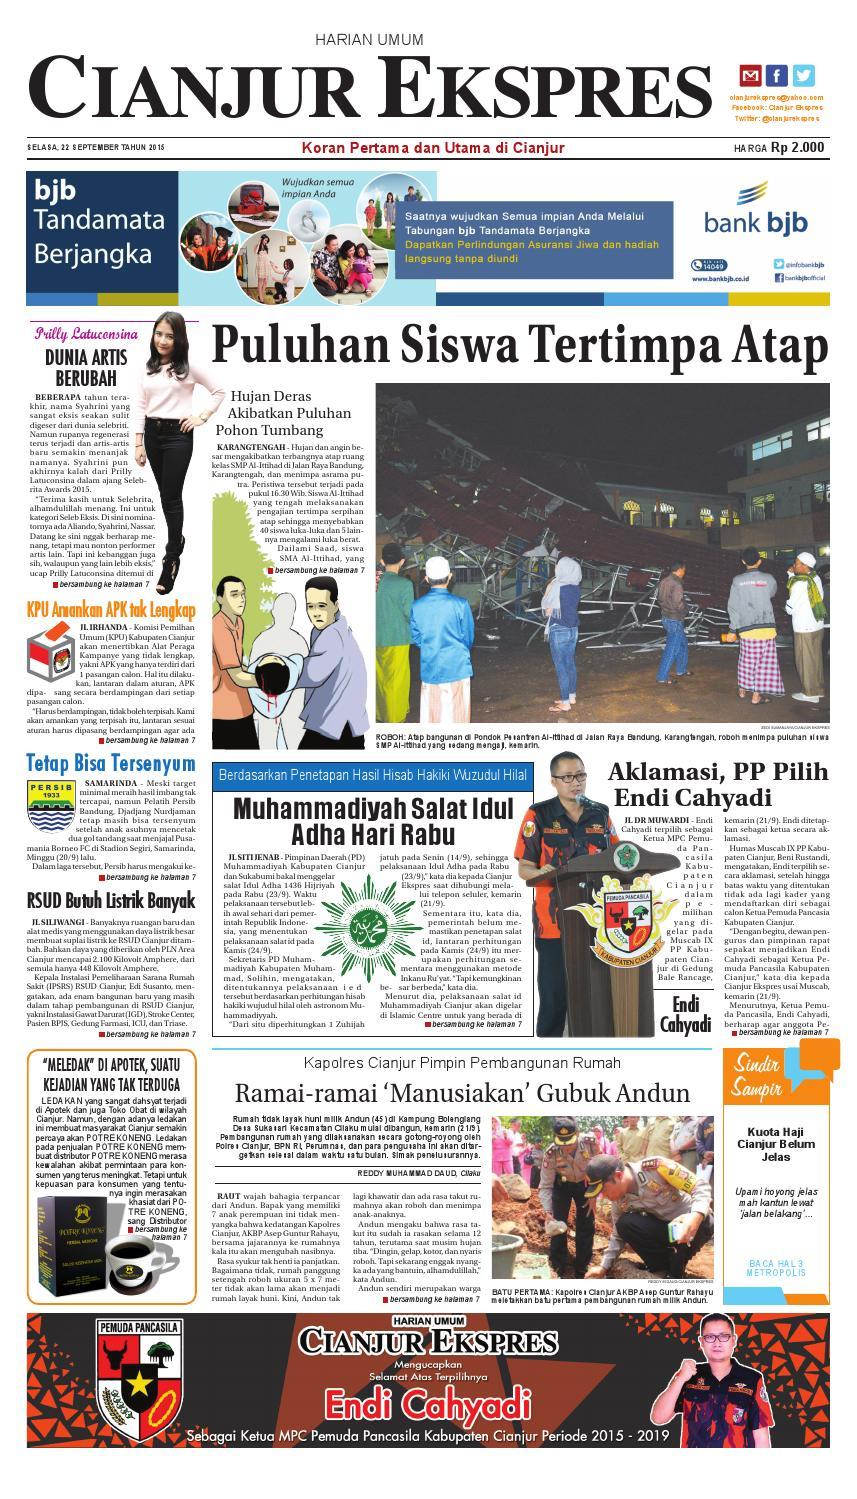 Epaper Cianjur Ekspres 22 September 2015 By Ricky Ari Issuu Yuki Springbed Premium Fr 78